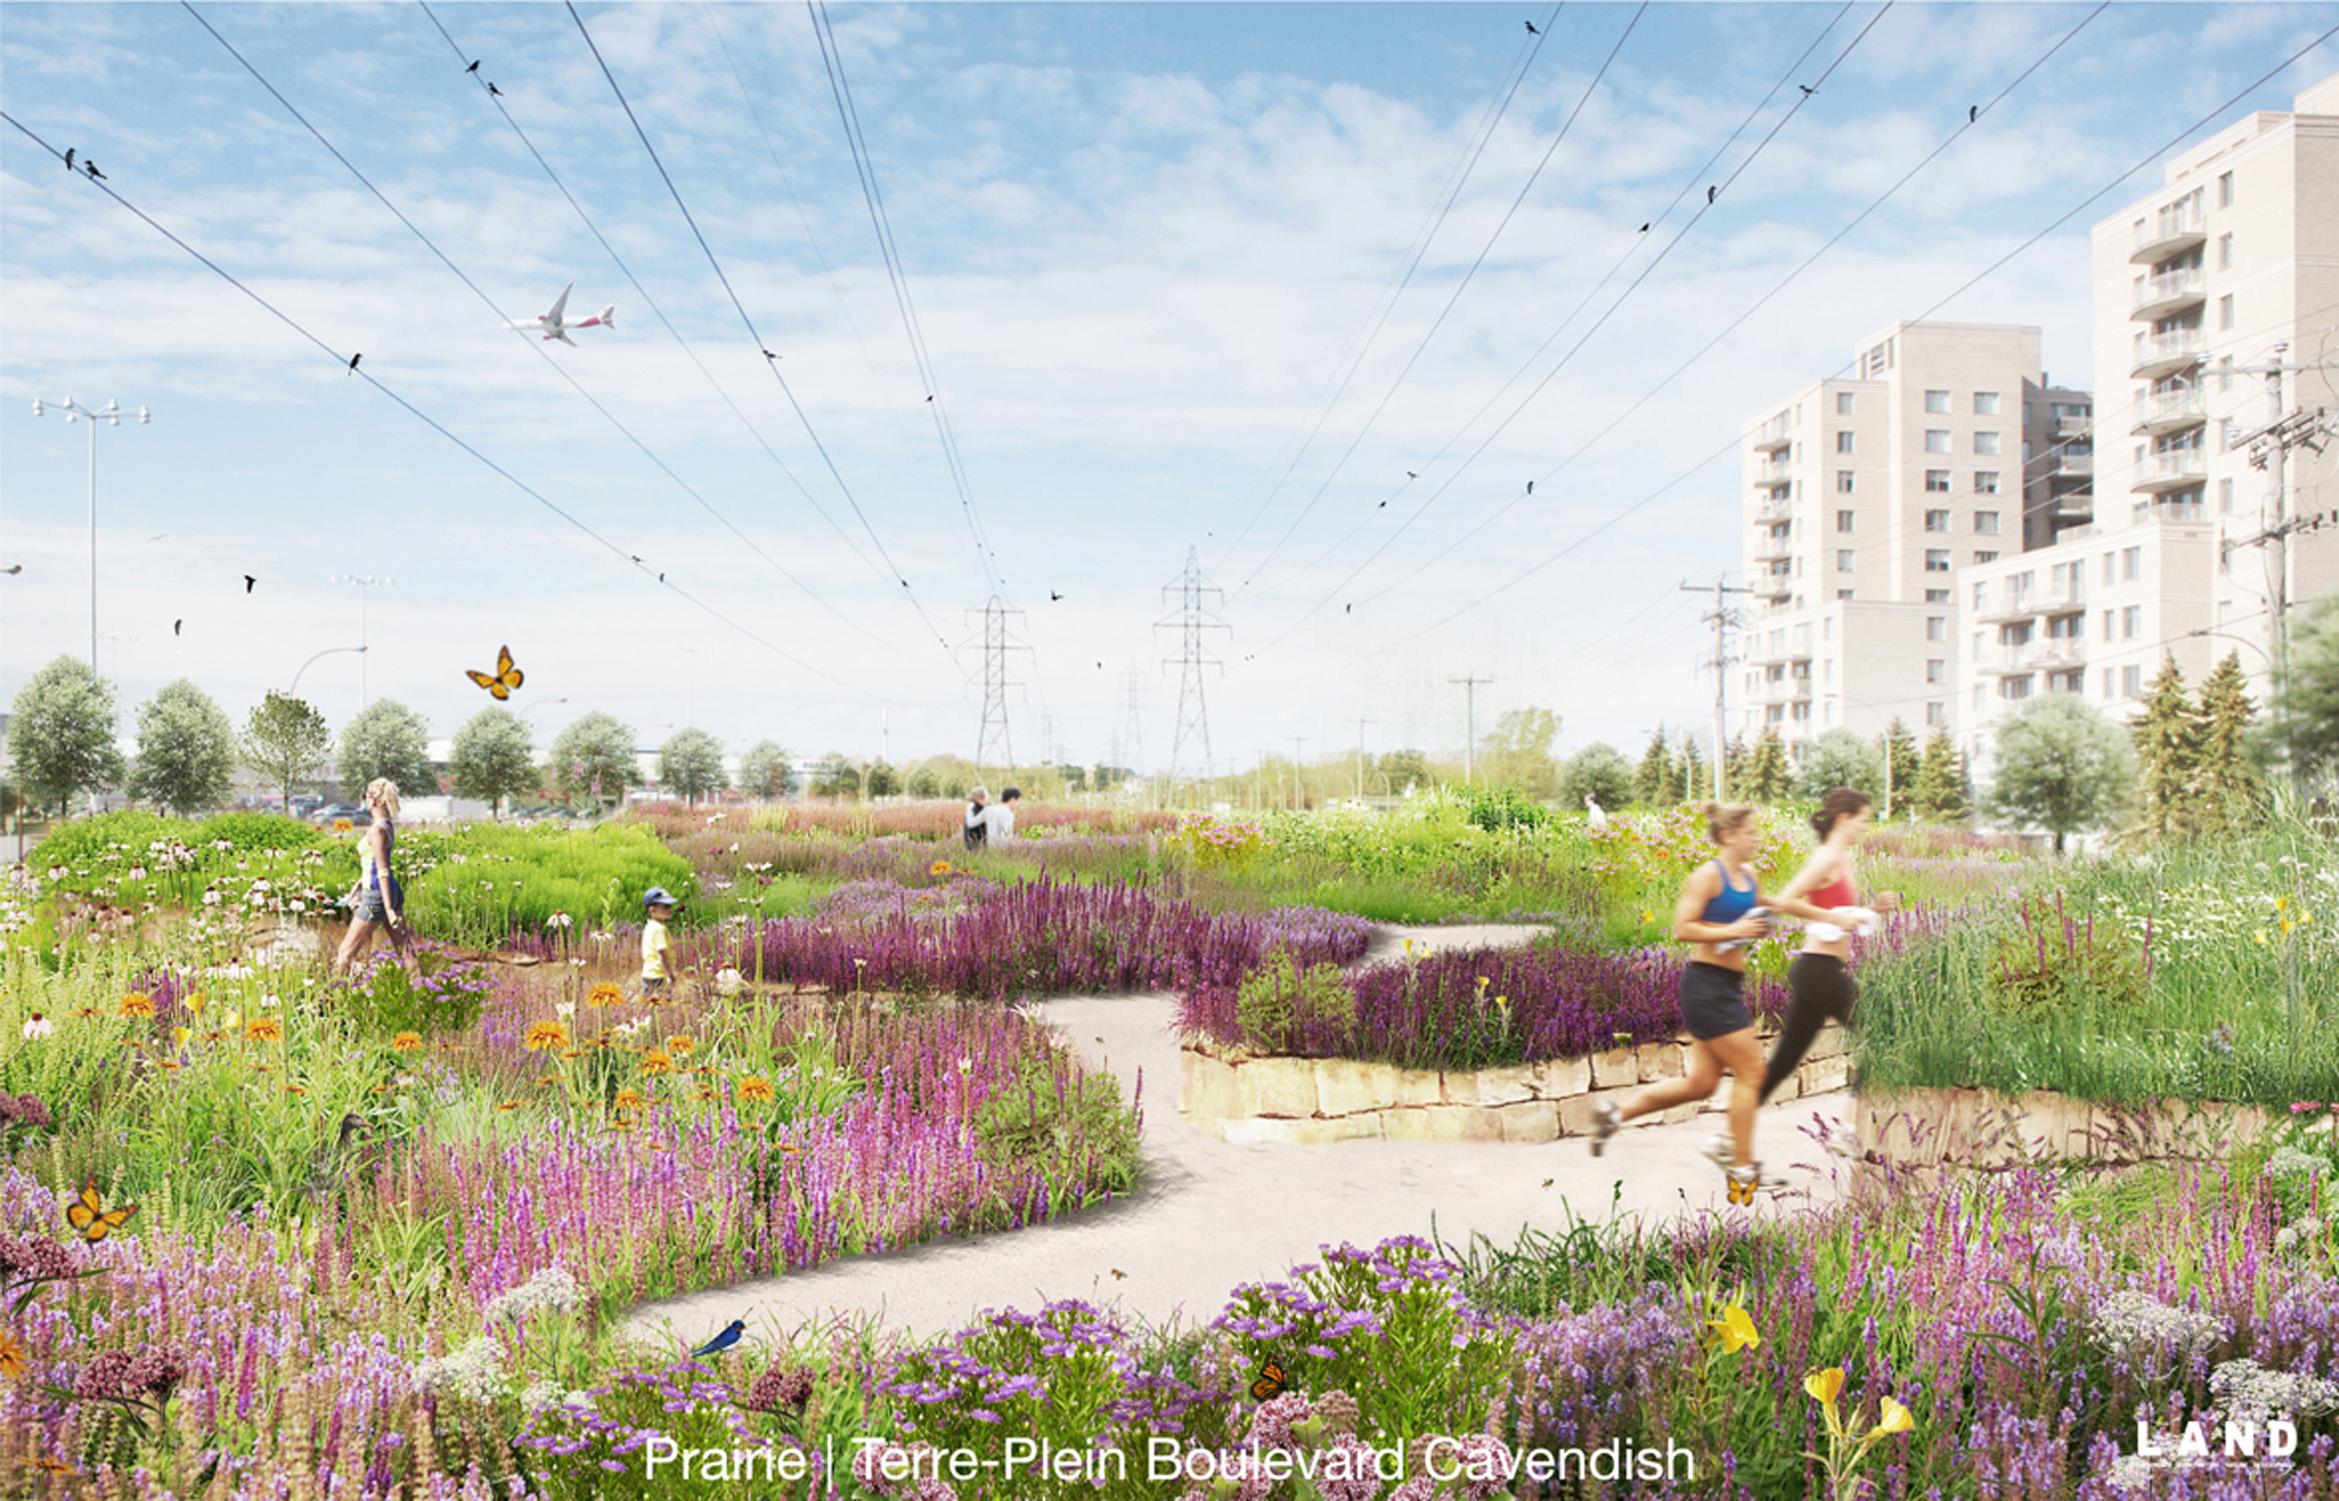 LAND_Corridor Biodiversité_Spring View.jpg